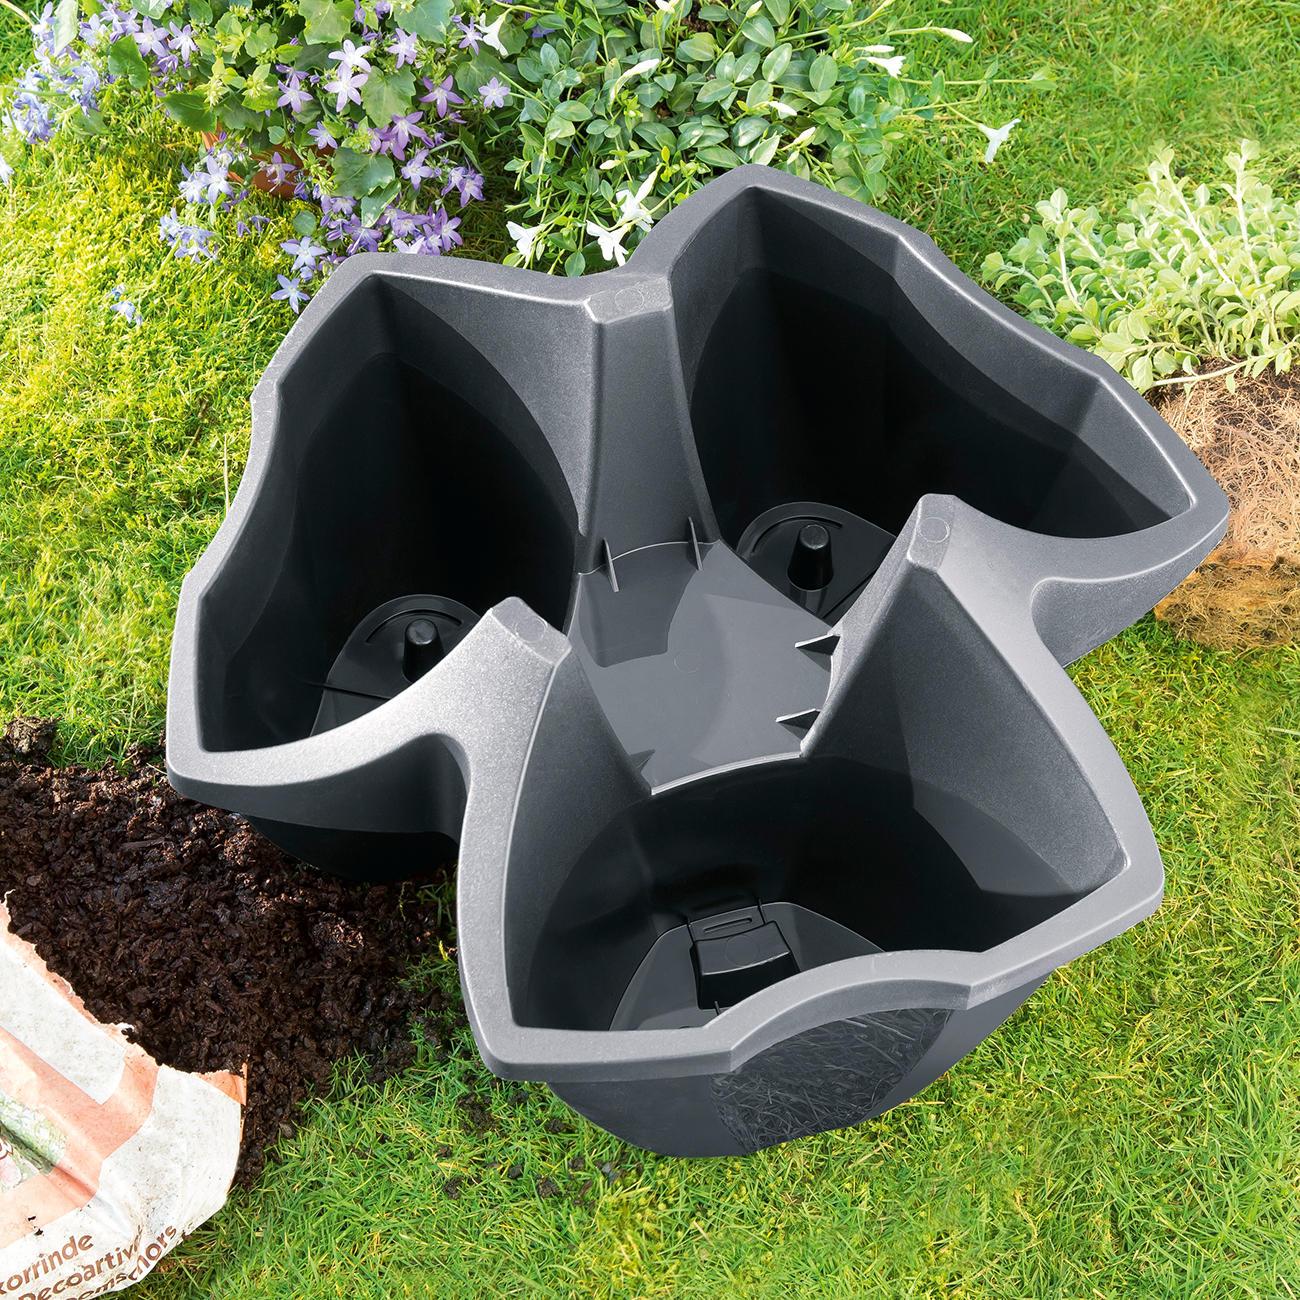 pflanzturm 3 st ckig 3 jahre garantie pro idee. Black Bedroom Furniture Sets. Home Design Ideas